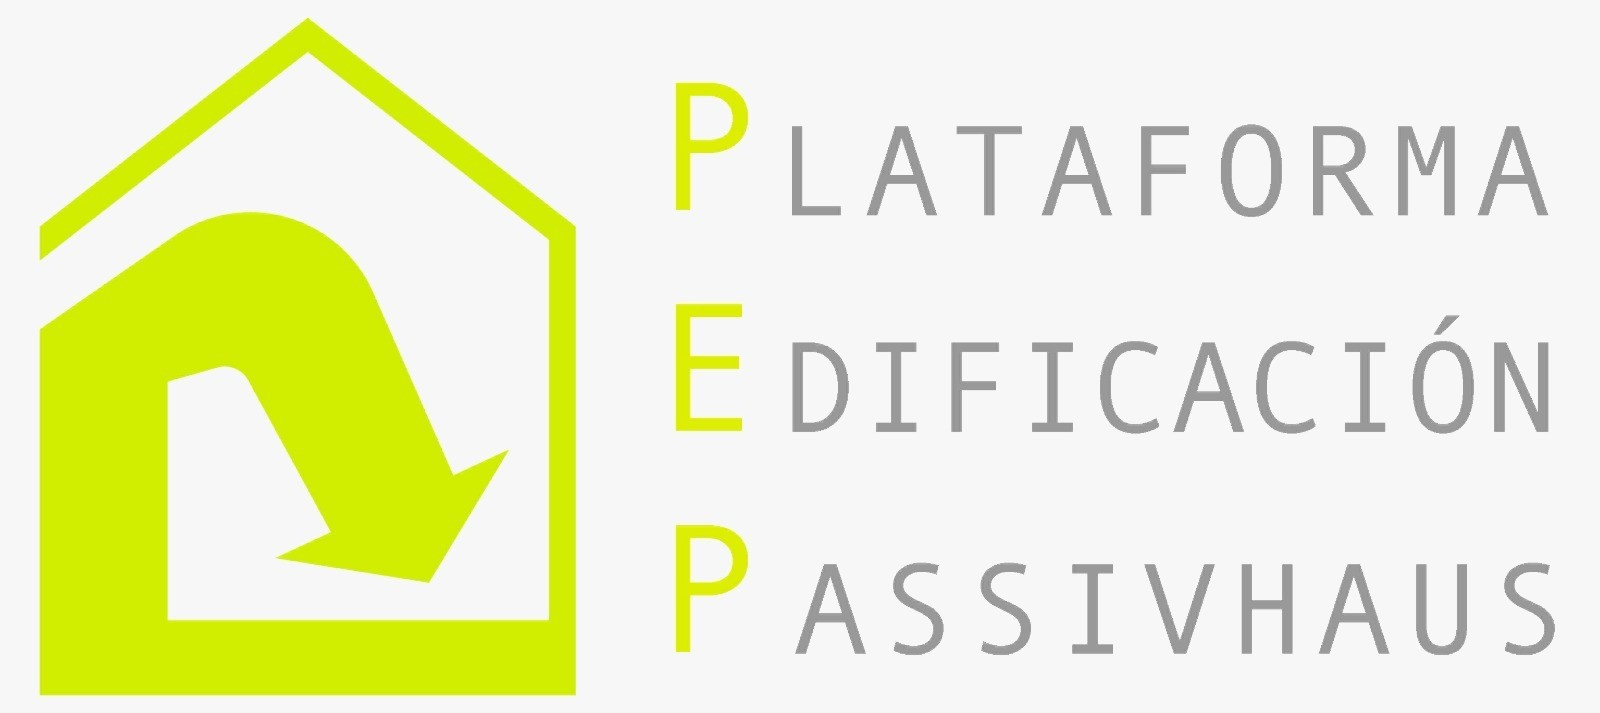 Plataforma Passivhaus Zero Energy Empresa de formacion